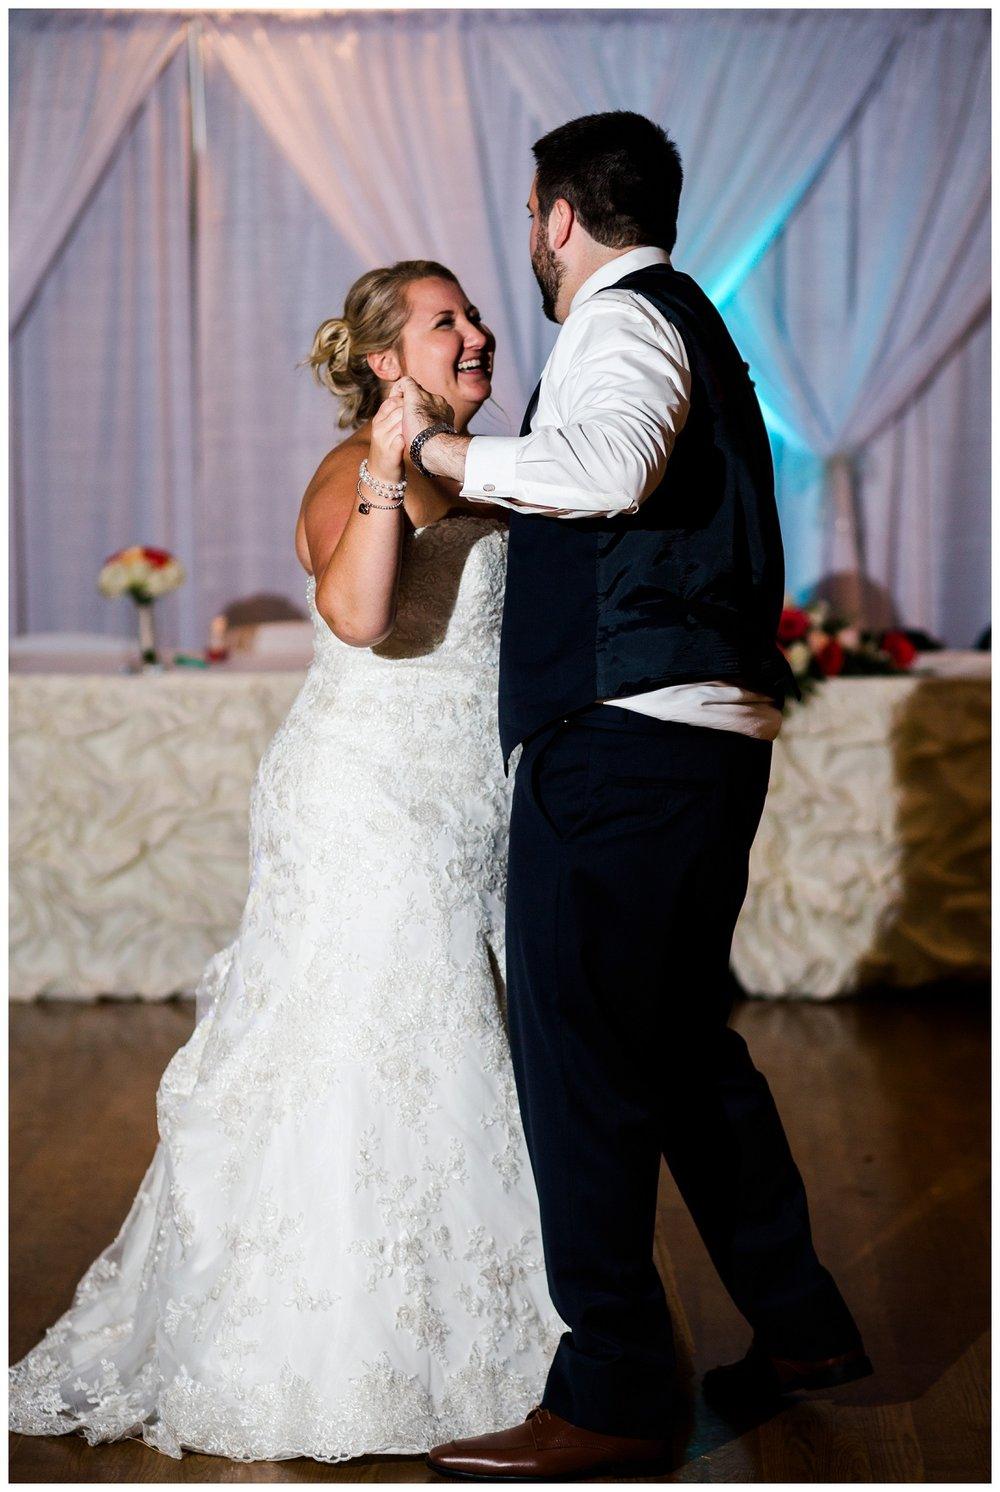 Mr. and Mrs. Kramp_0076.jpg